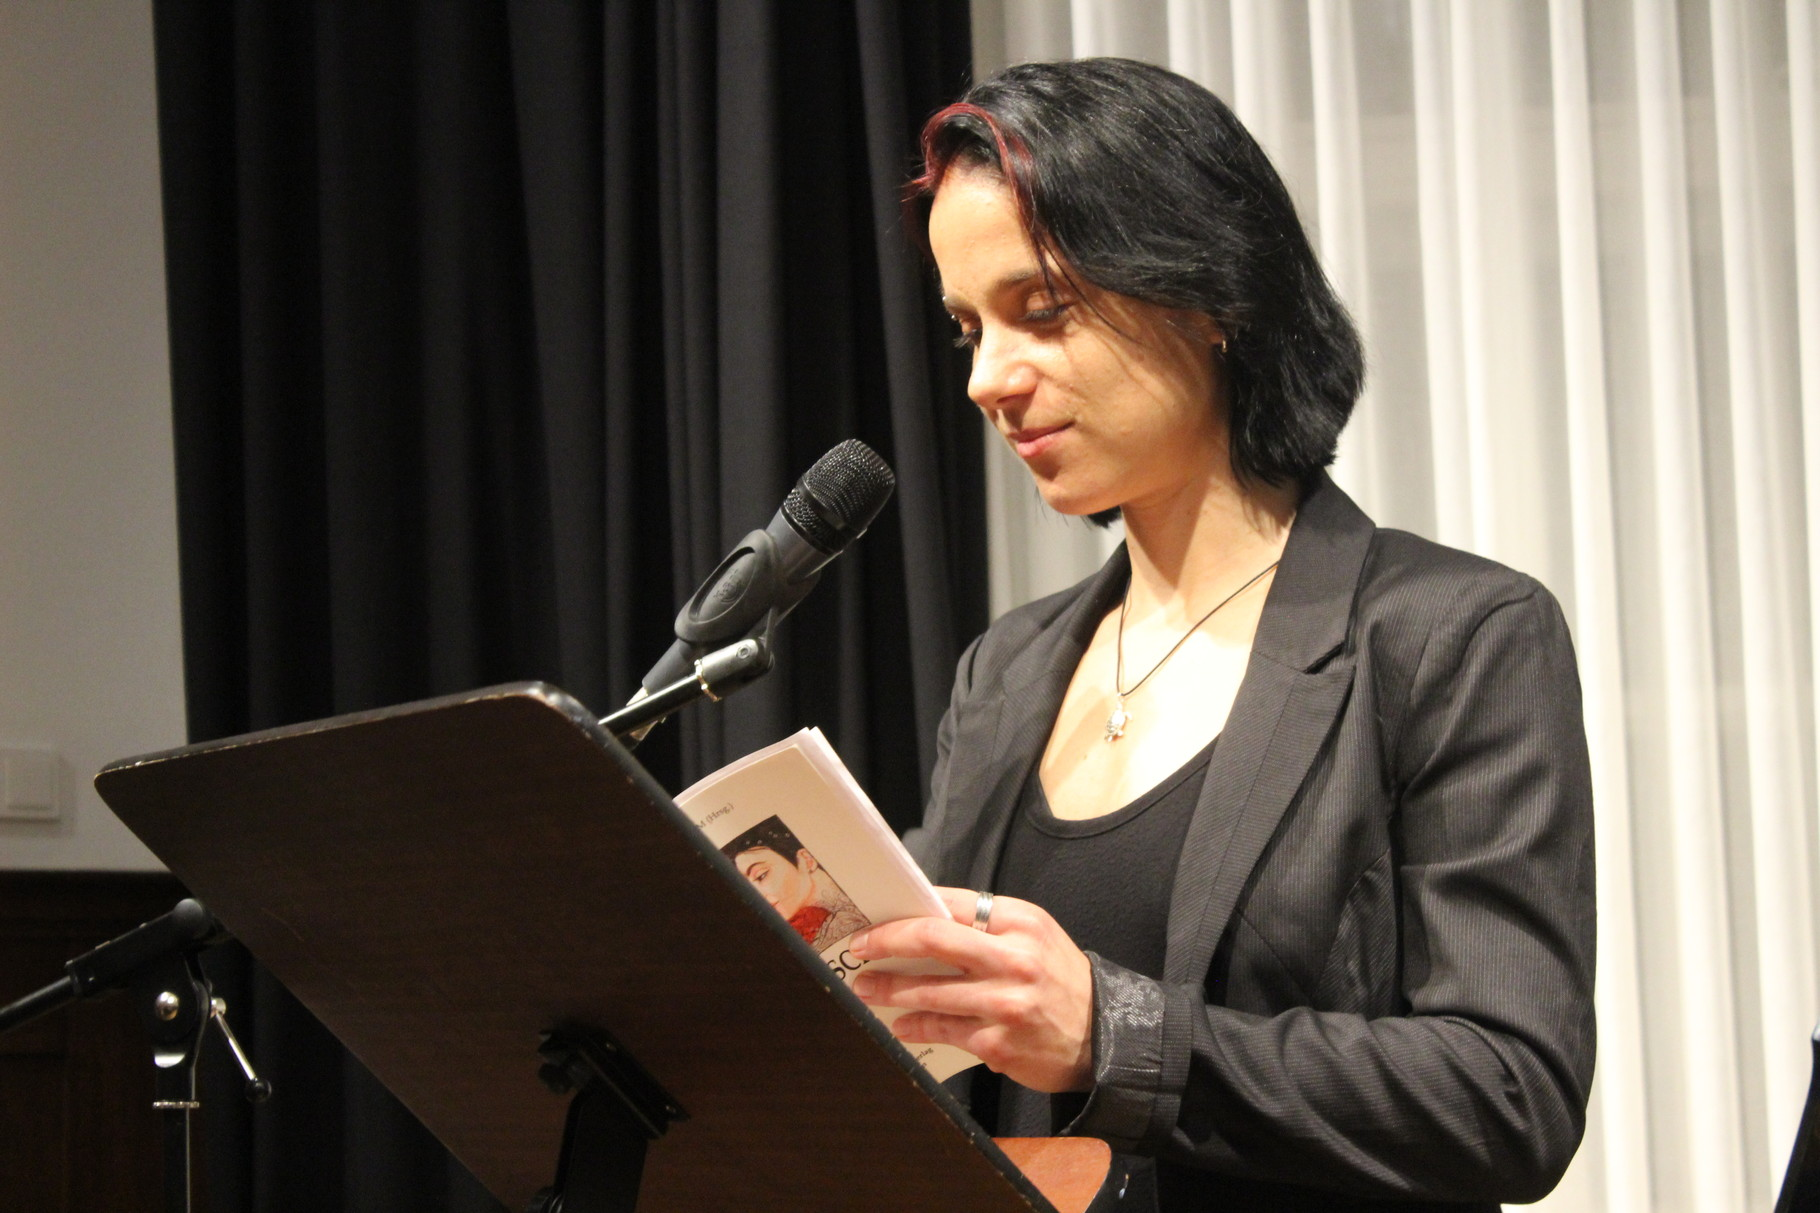 Sabine Brandl